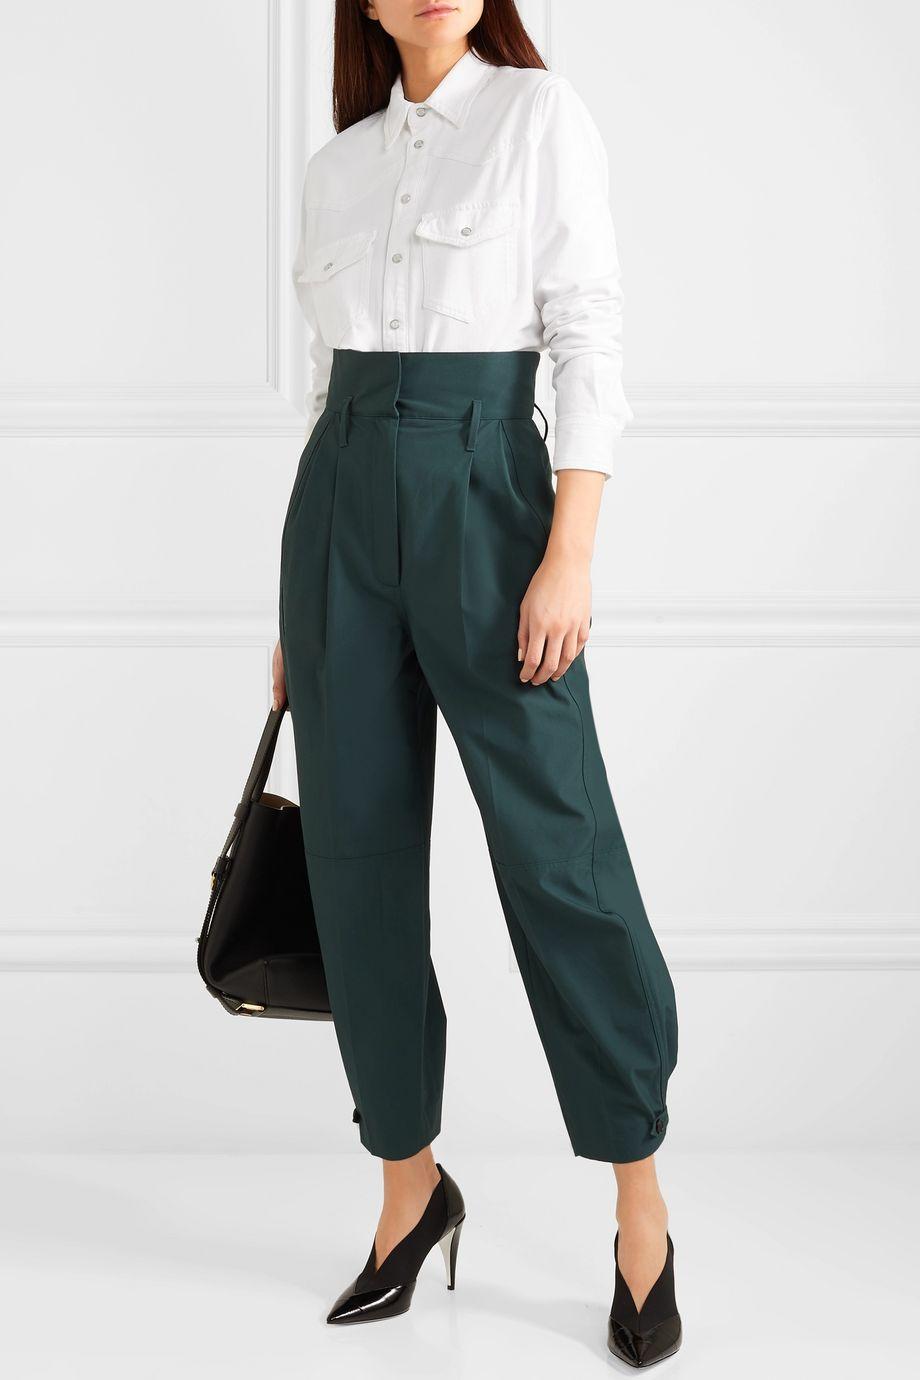 Givenchy Frayed denim shirt